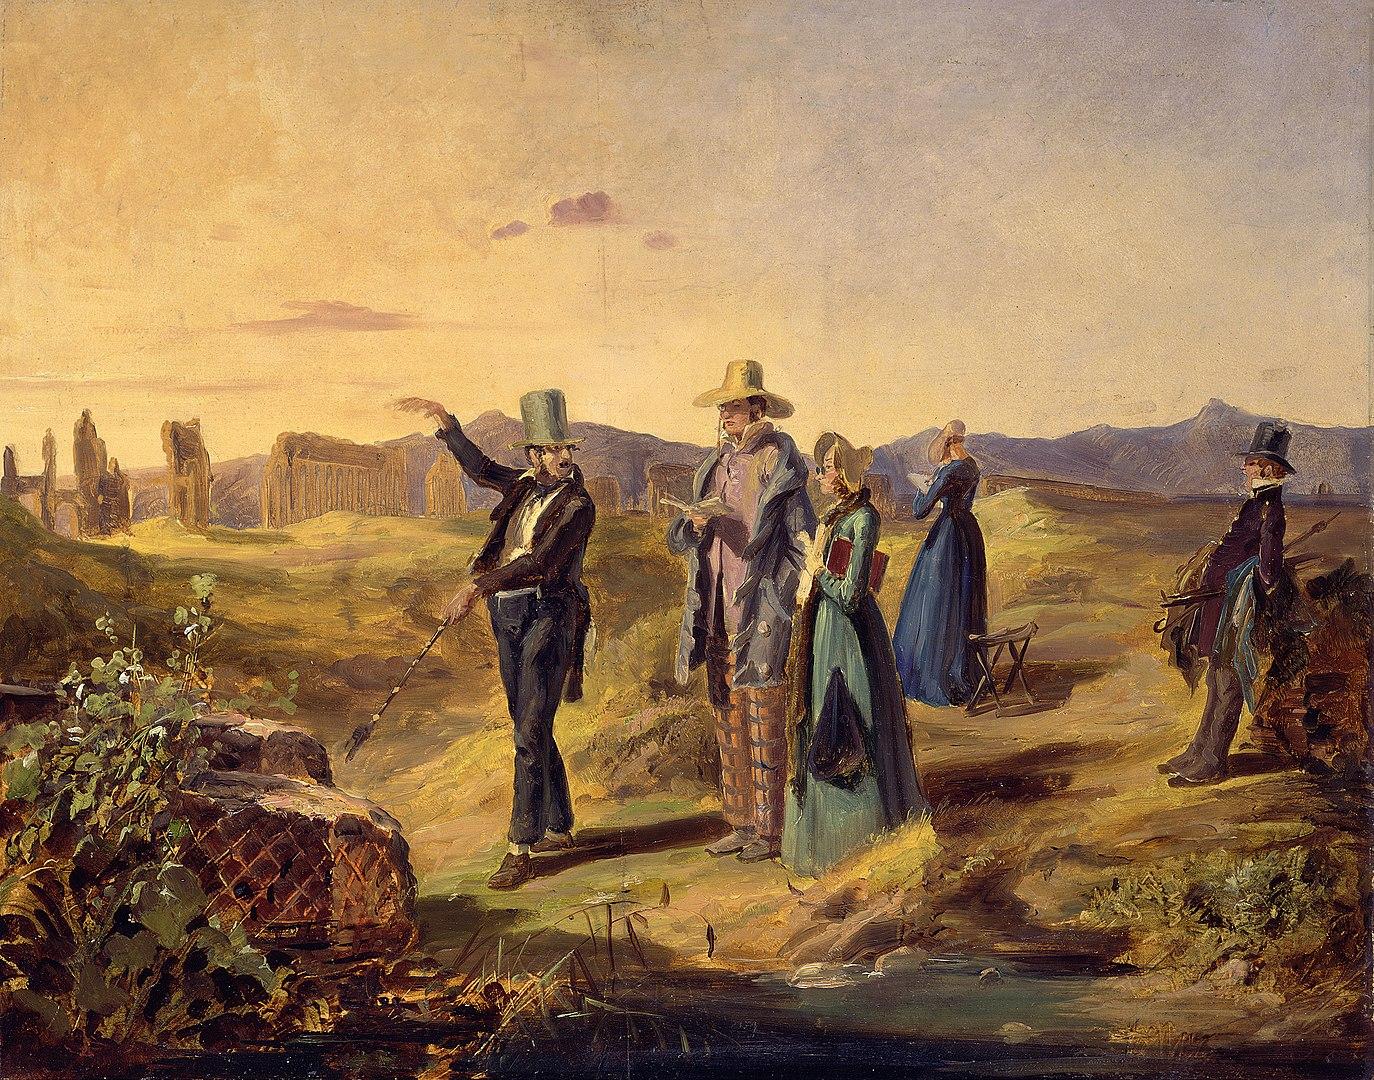 Artist - Carl Spitzweg - English Tourists in the 'Campagna' c. 1835